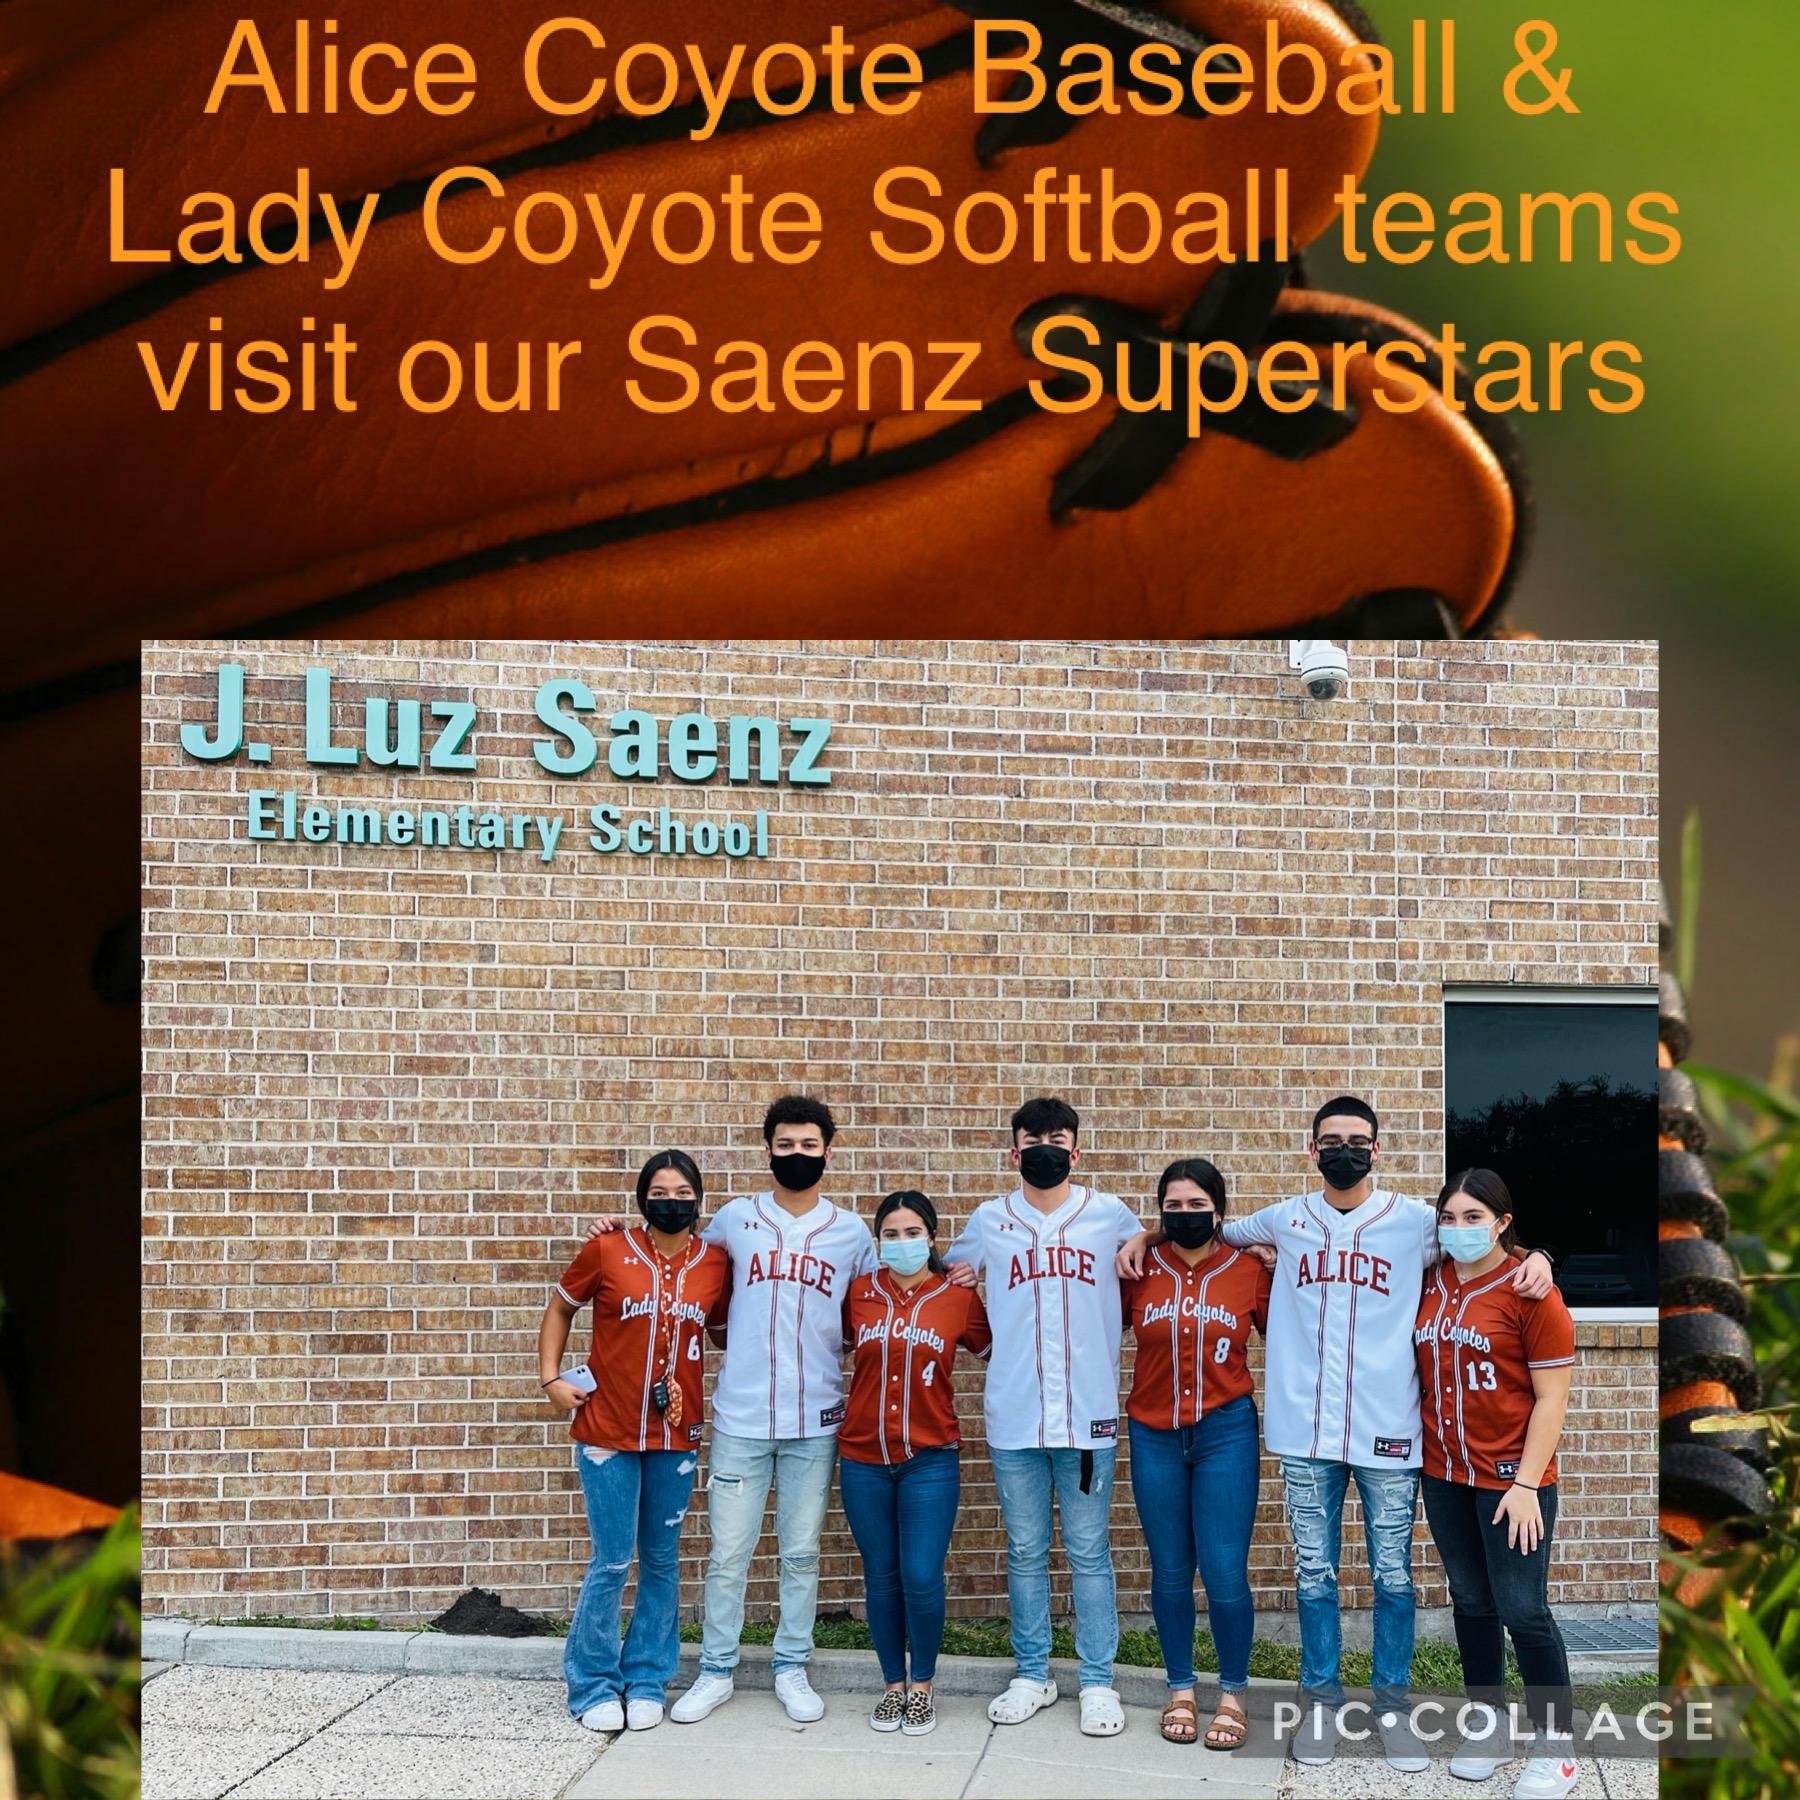 Thank you AHS Coyote Softball & Baseball team